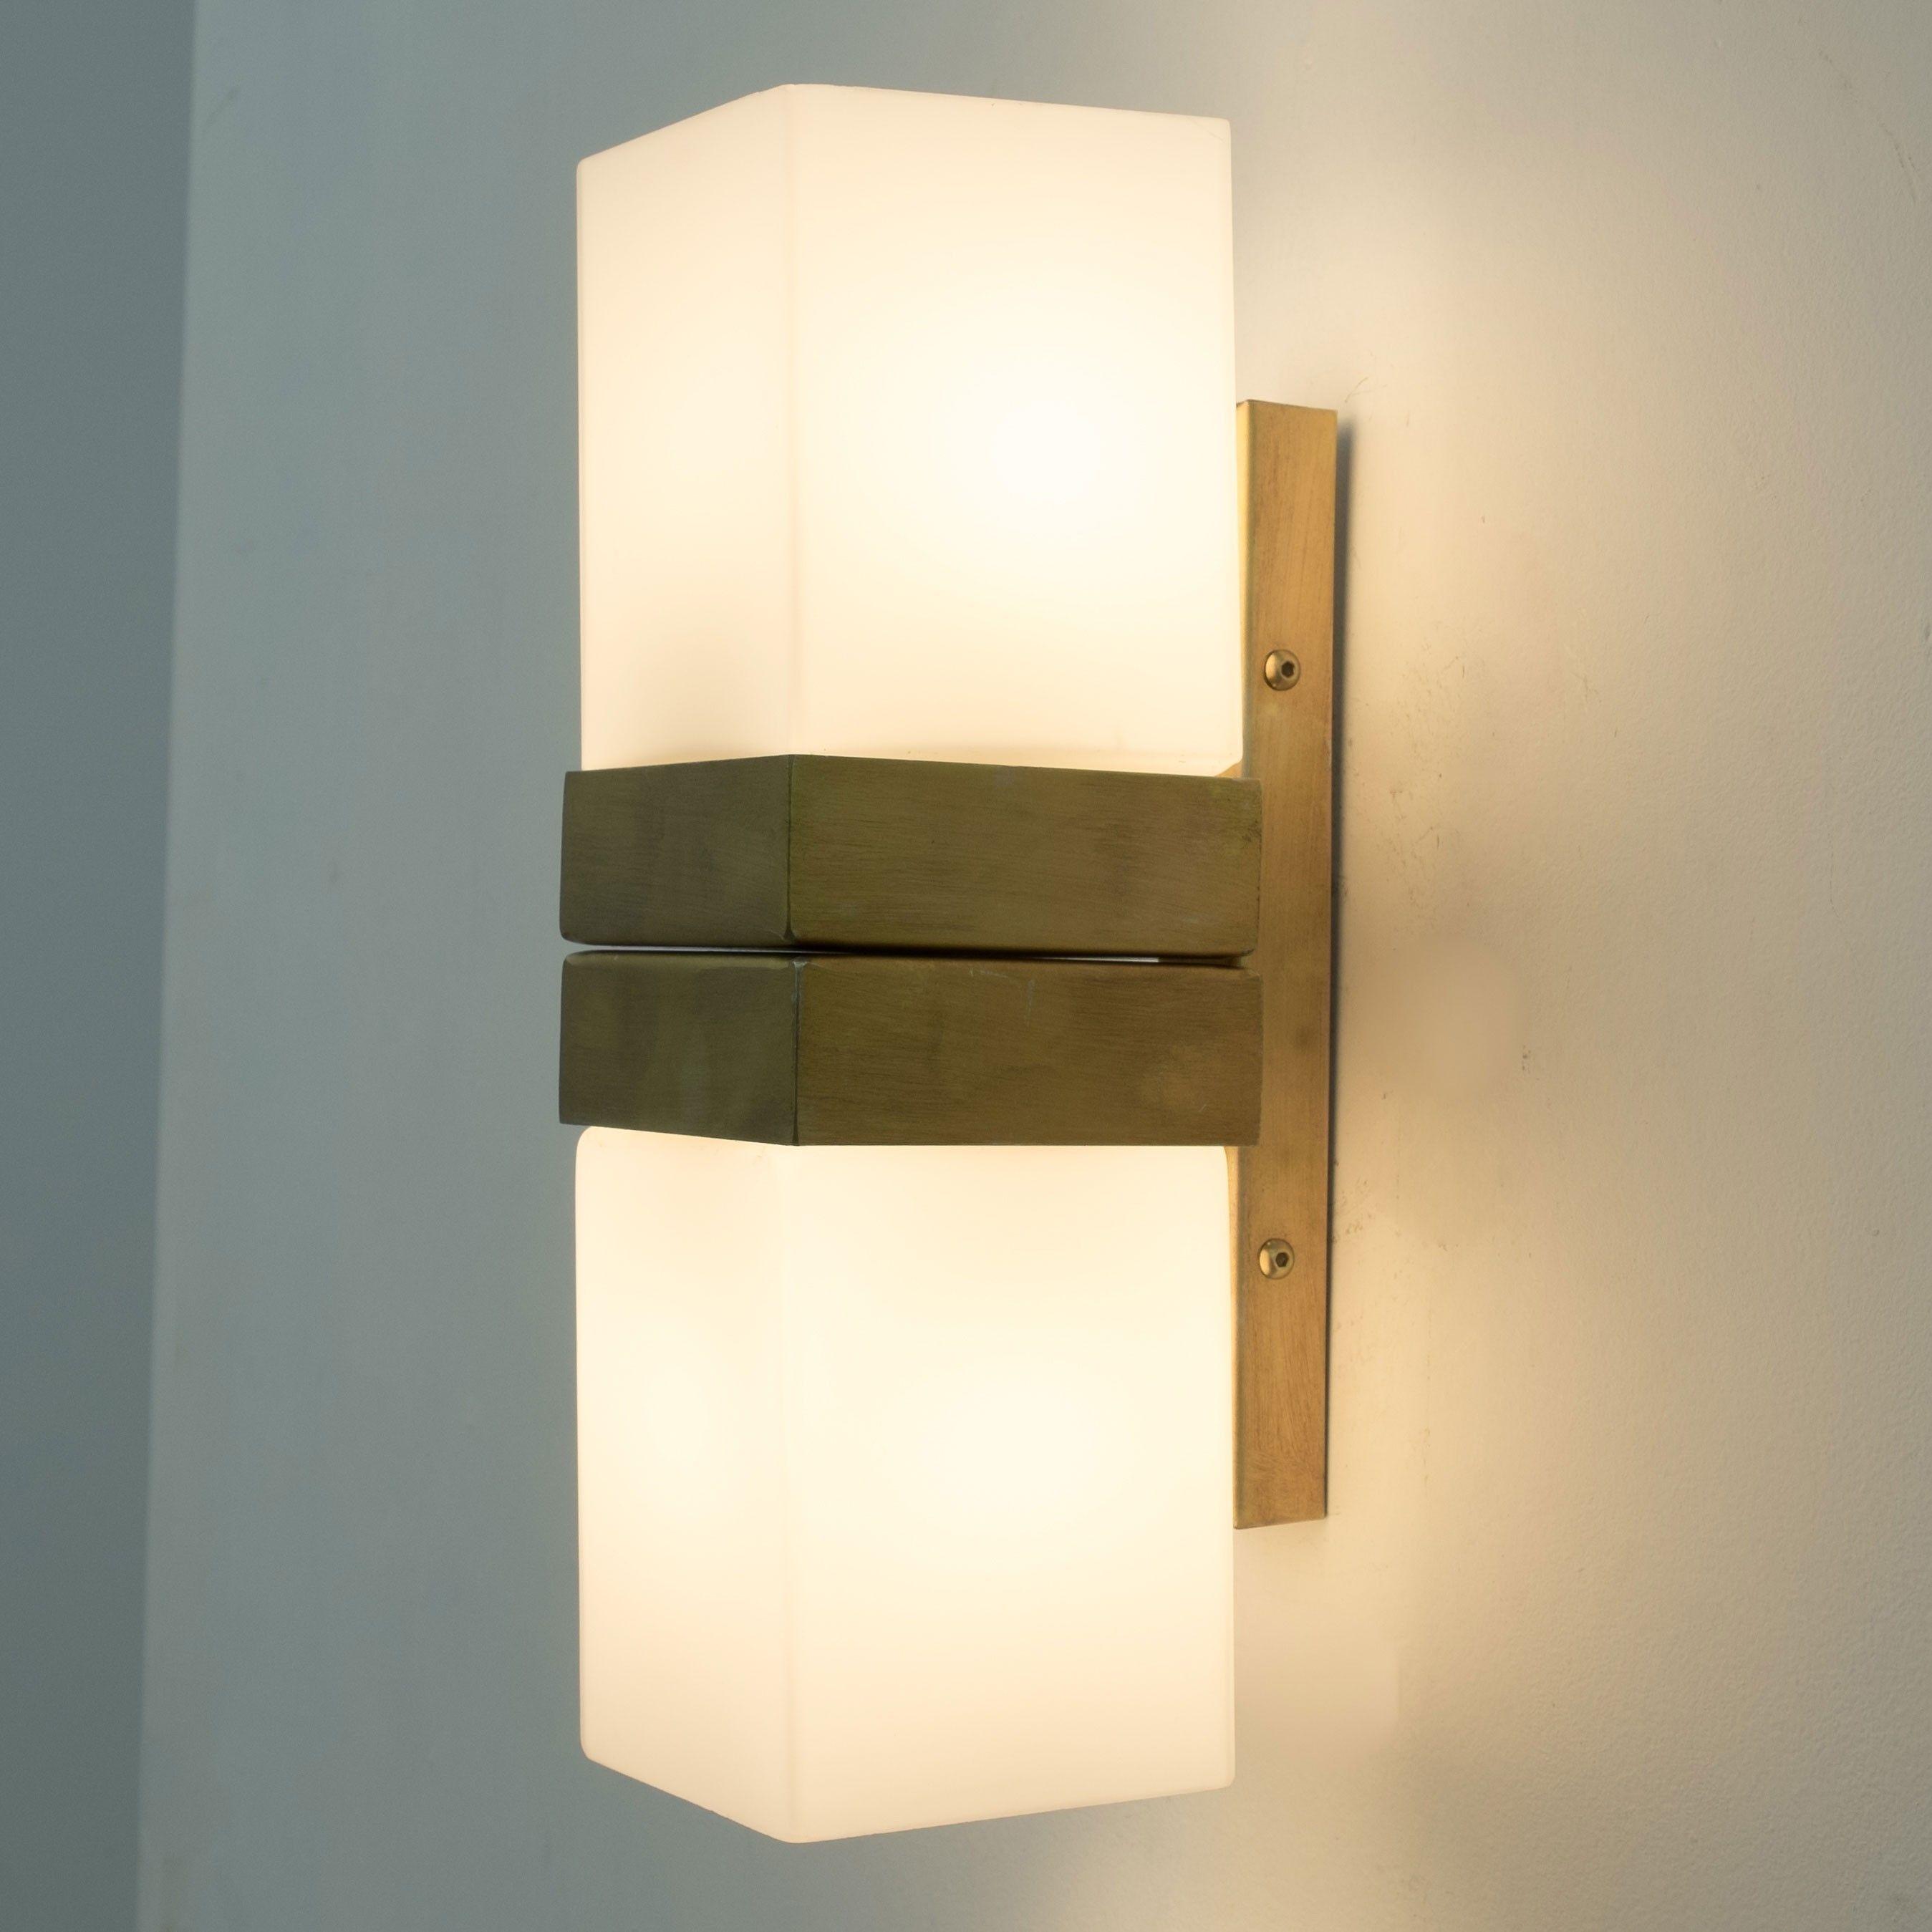 Aplique De Pared Vintage Cuadrados De Cristal Jimena Apliques De Pared Diseno De Interiores Paredes Iluminadas